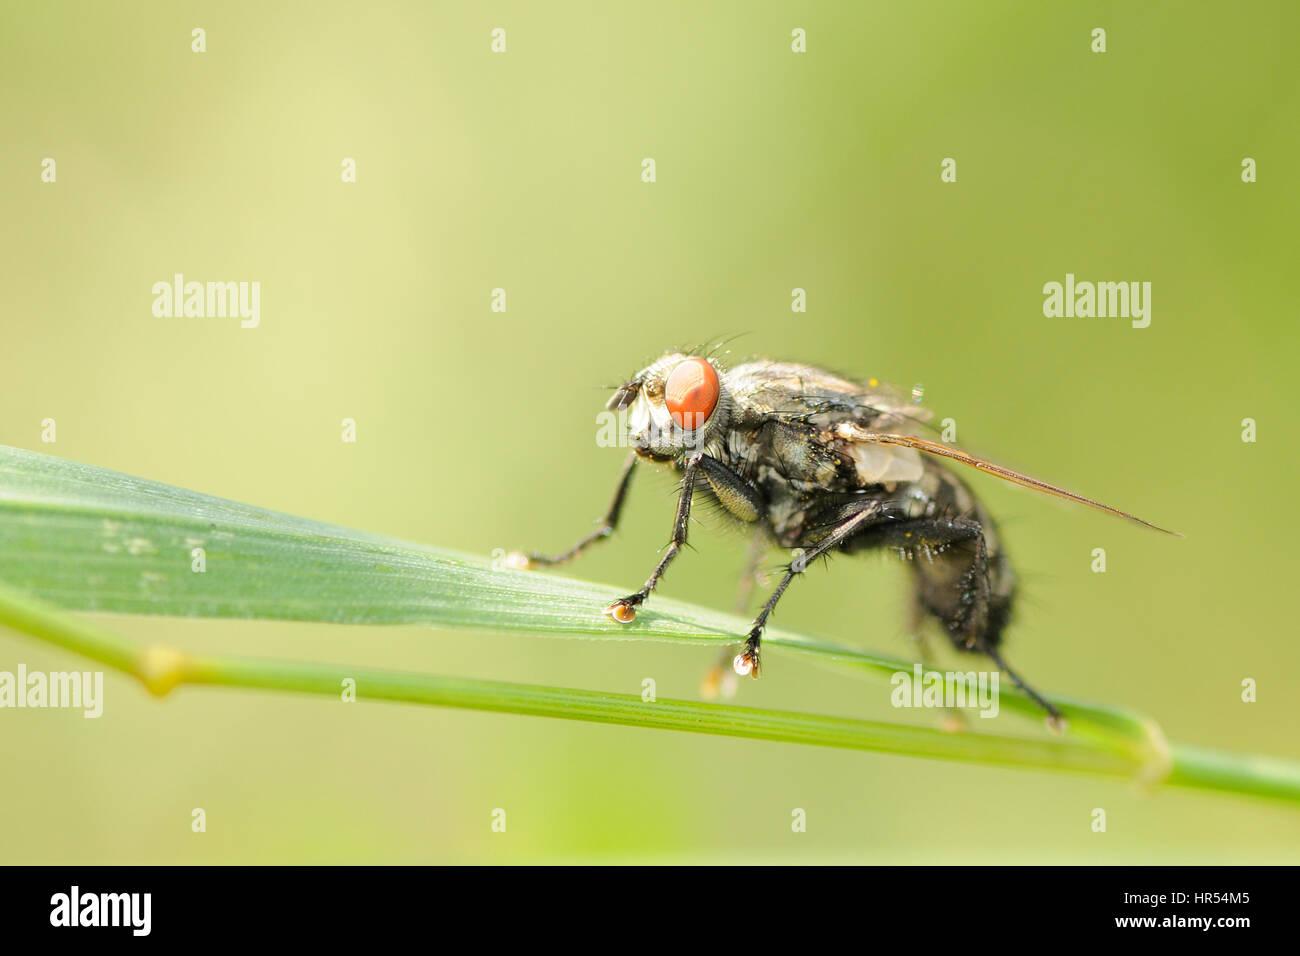 Housefly © Pawel M. Mikucki Stock Photo